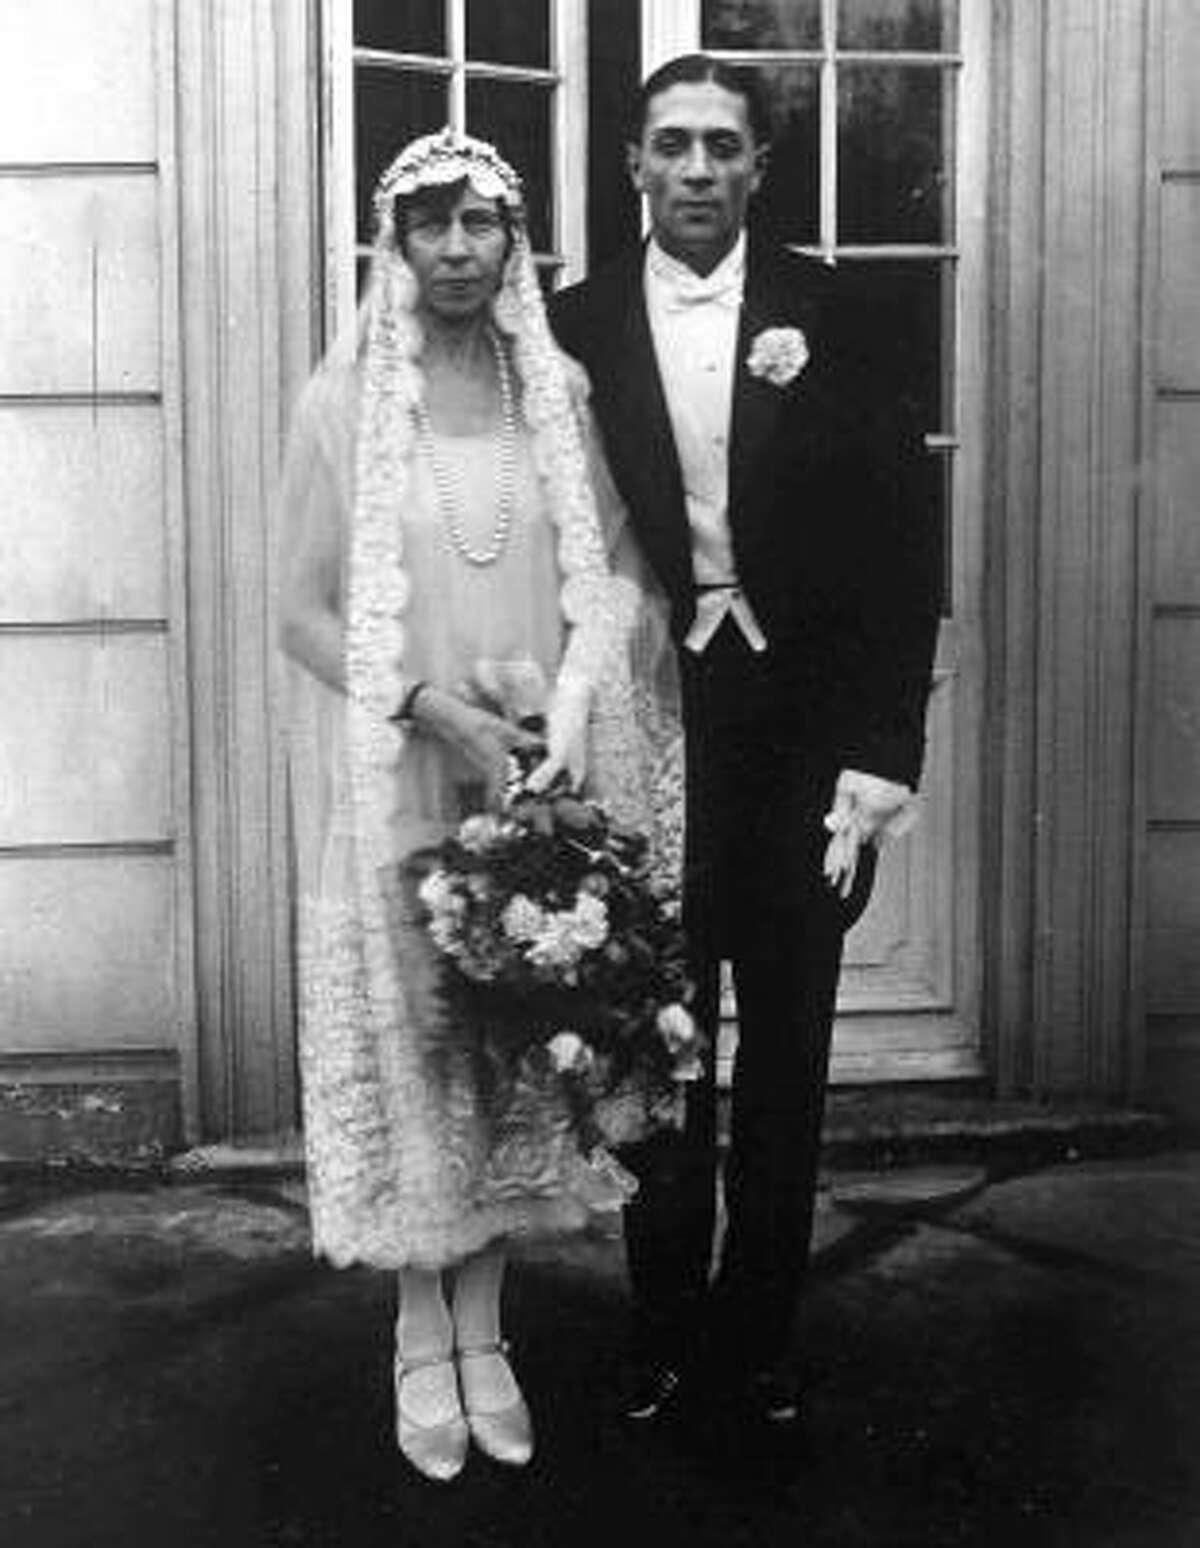 Germany's Princess Victoria zu Schaumburg-Lippe, sister of Kaiser Wilhelm II, chose a Spanish-style mantilla when she wed Russian adventurer Alexander Dvorjanin Zubkov after their wedding in Bonn, Germany, Nov. 22, 1927.